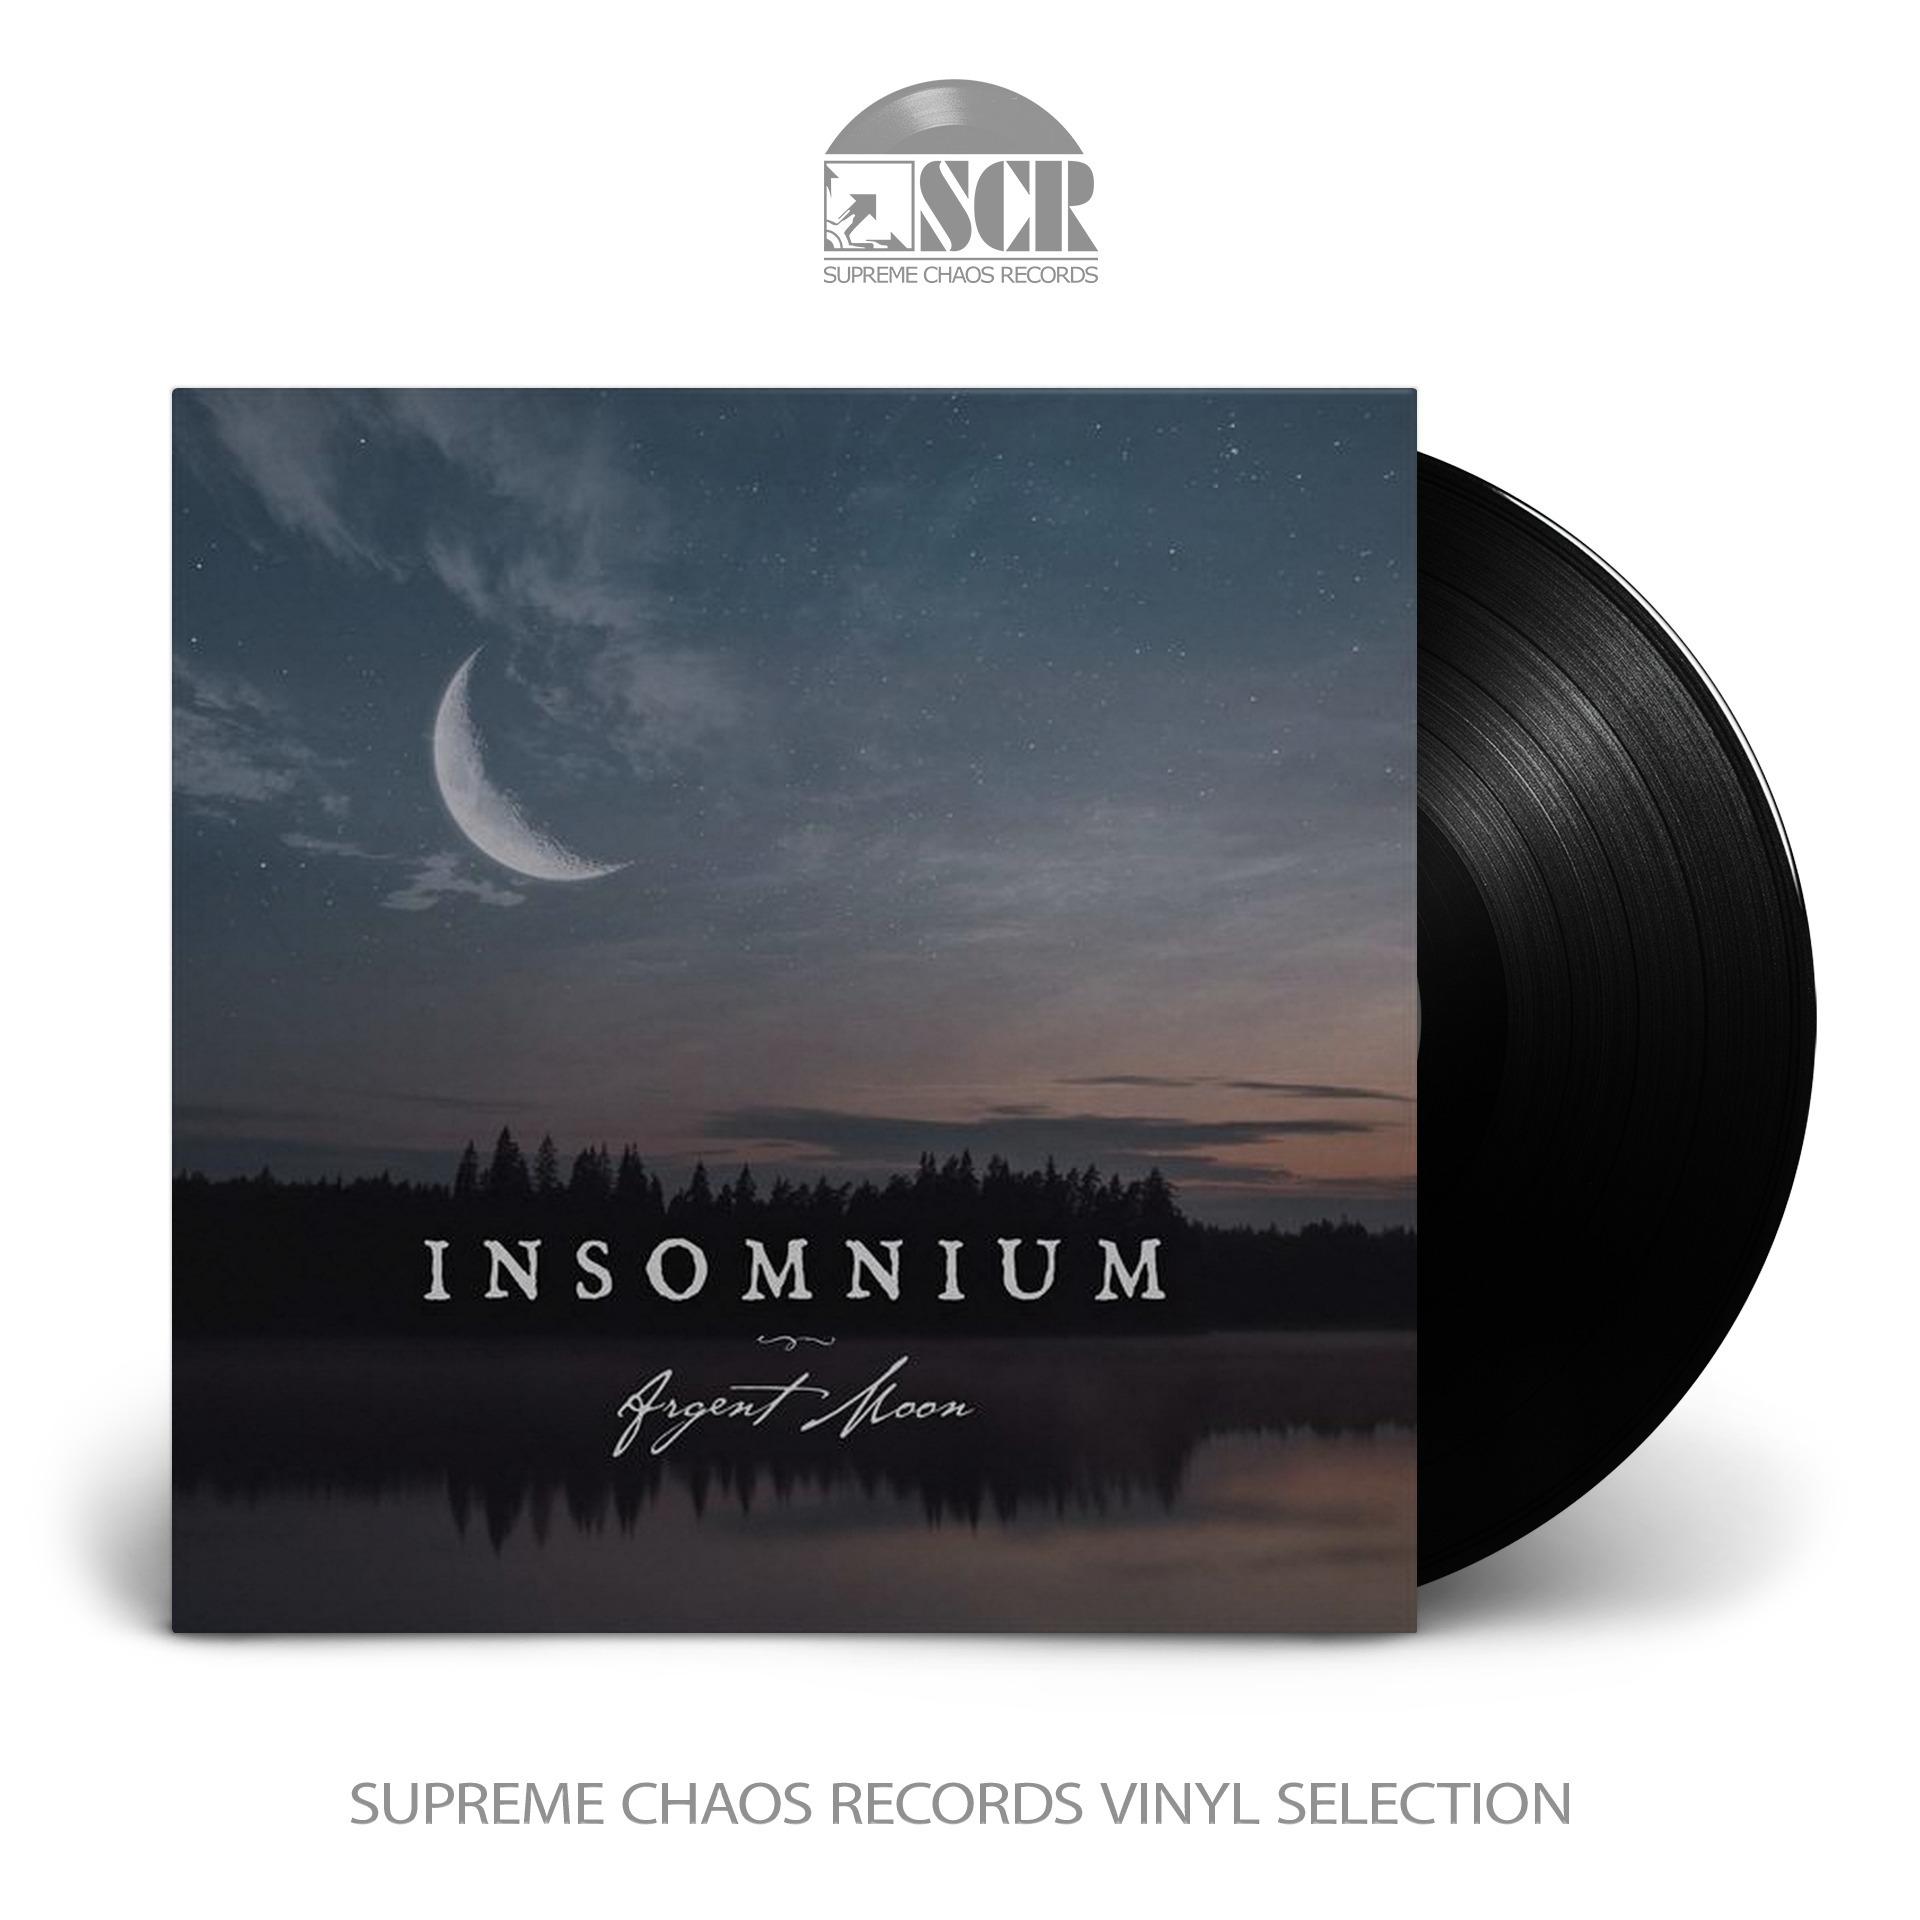 INSOMNIUM - Argent Moon EP [BLACK] (LP)